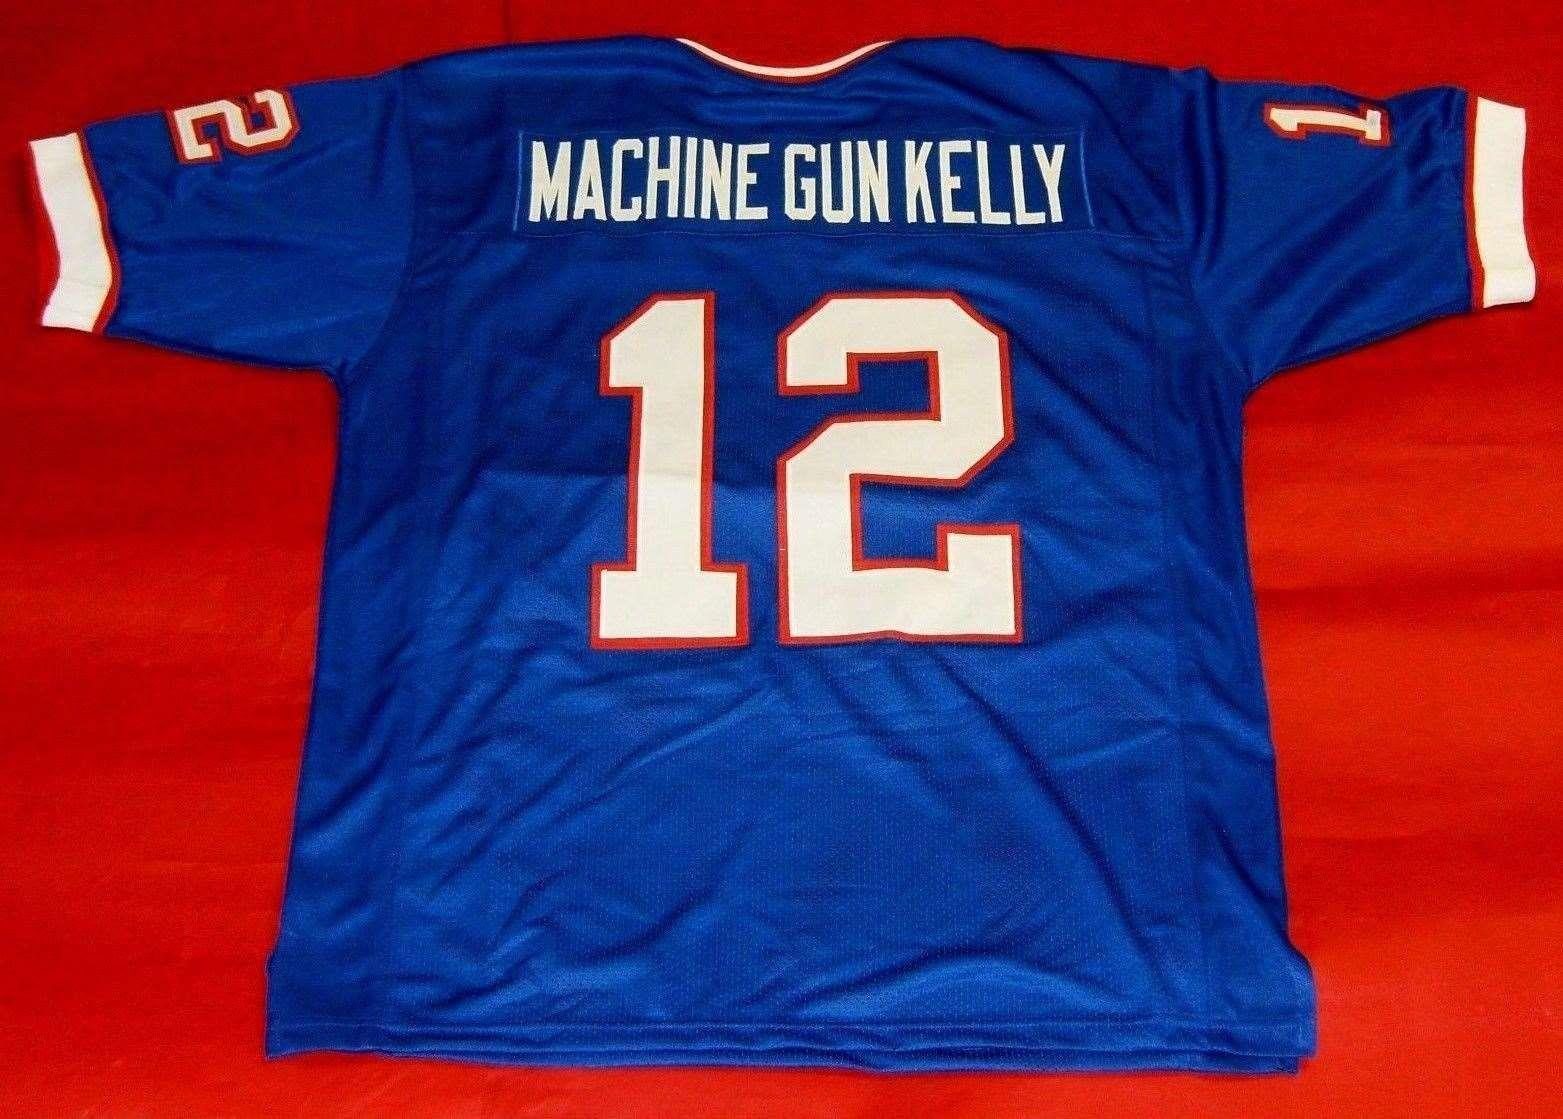 half off 09f66 4a14a Cheap retro #12 JIM KELLY CUSTOM MITCHELL & NESS Jersey MACHINE GUN KELLY  bule Mens Stitching High-end Size S-5XL Football Jerseys College N